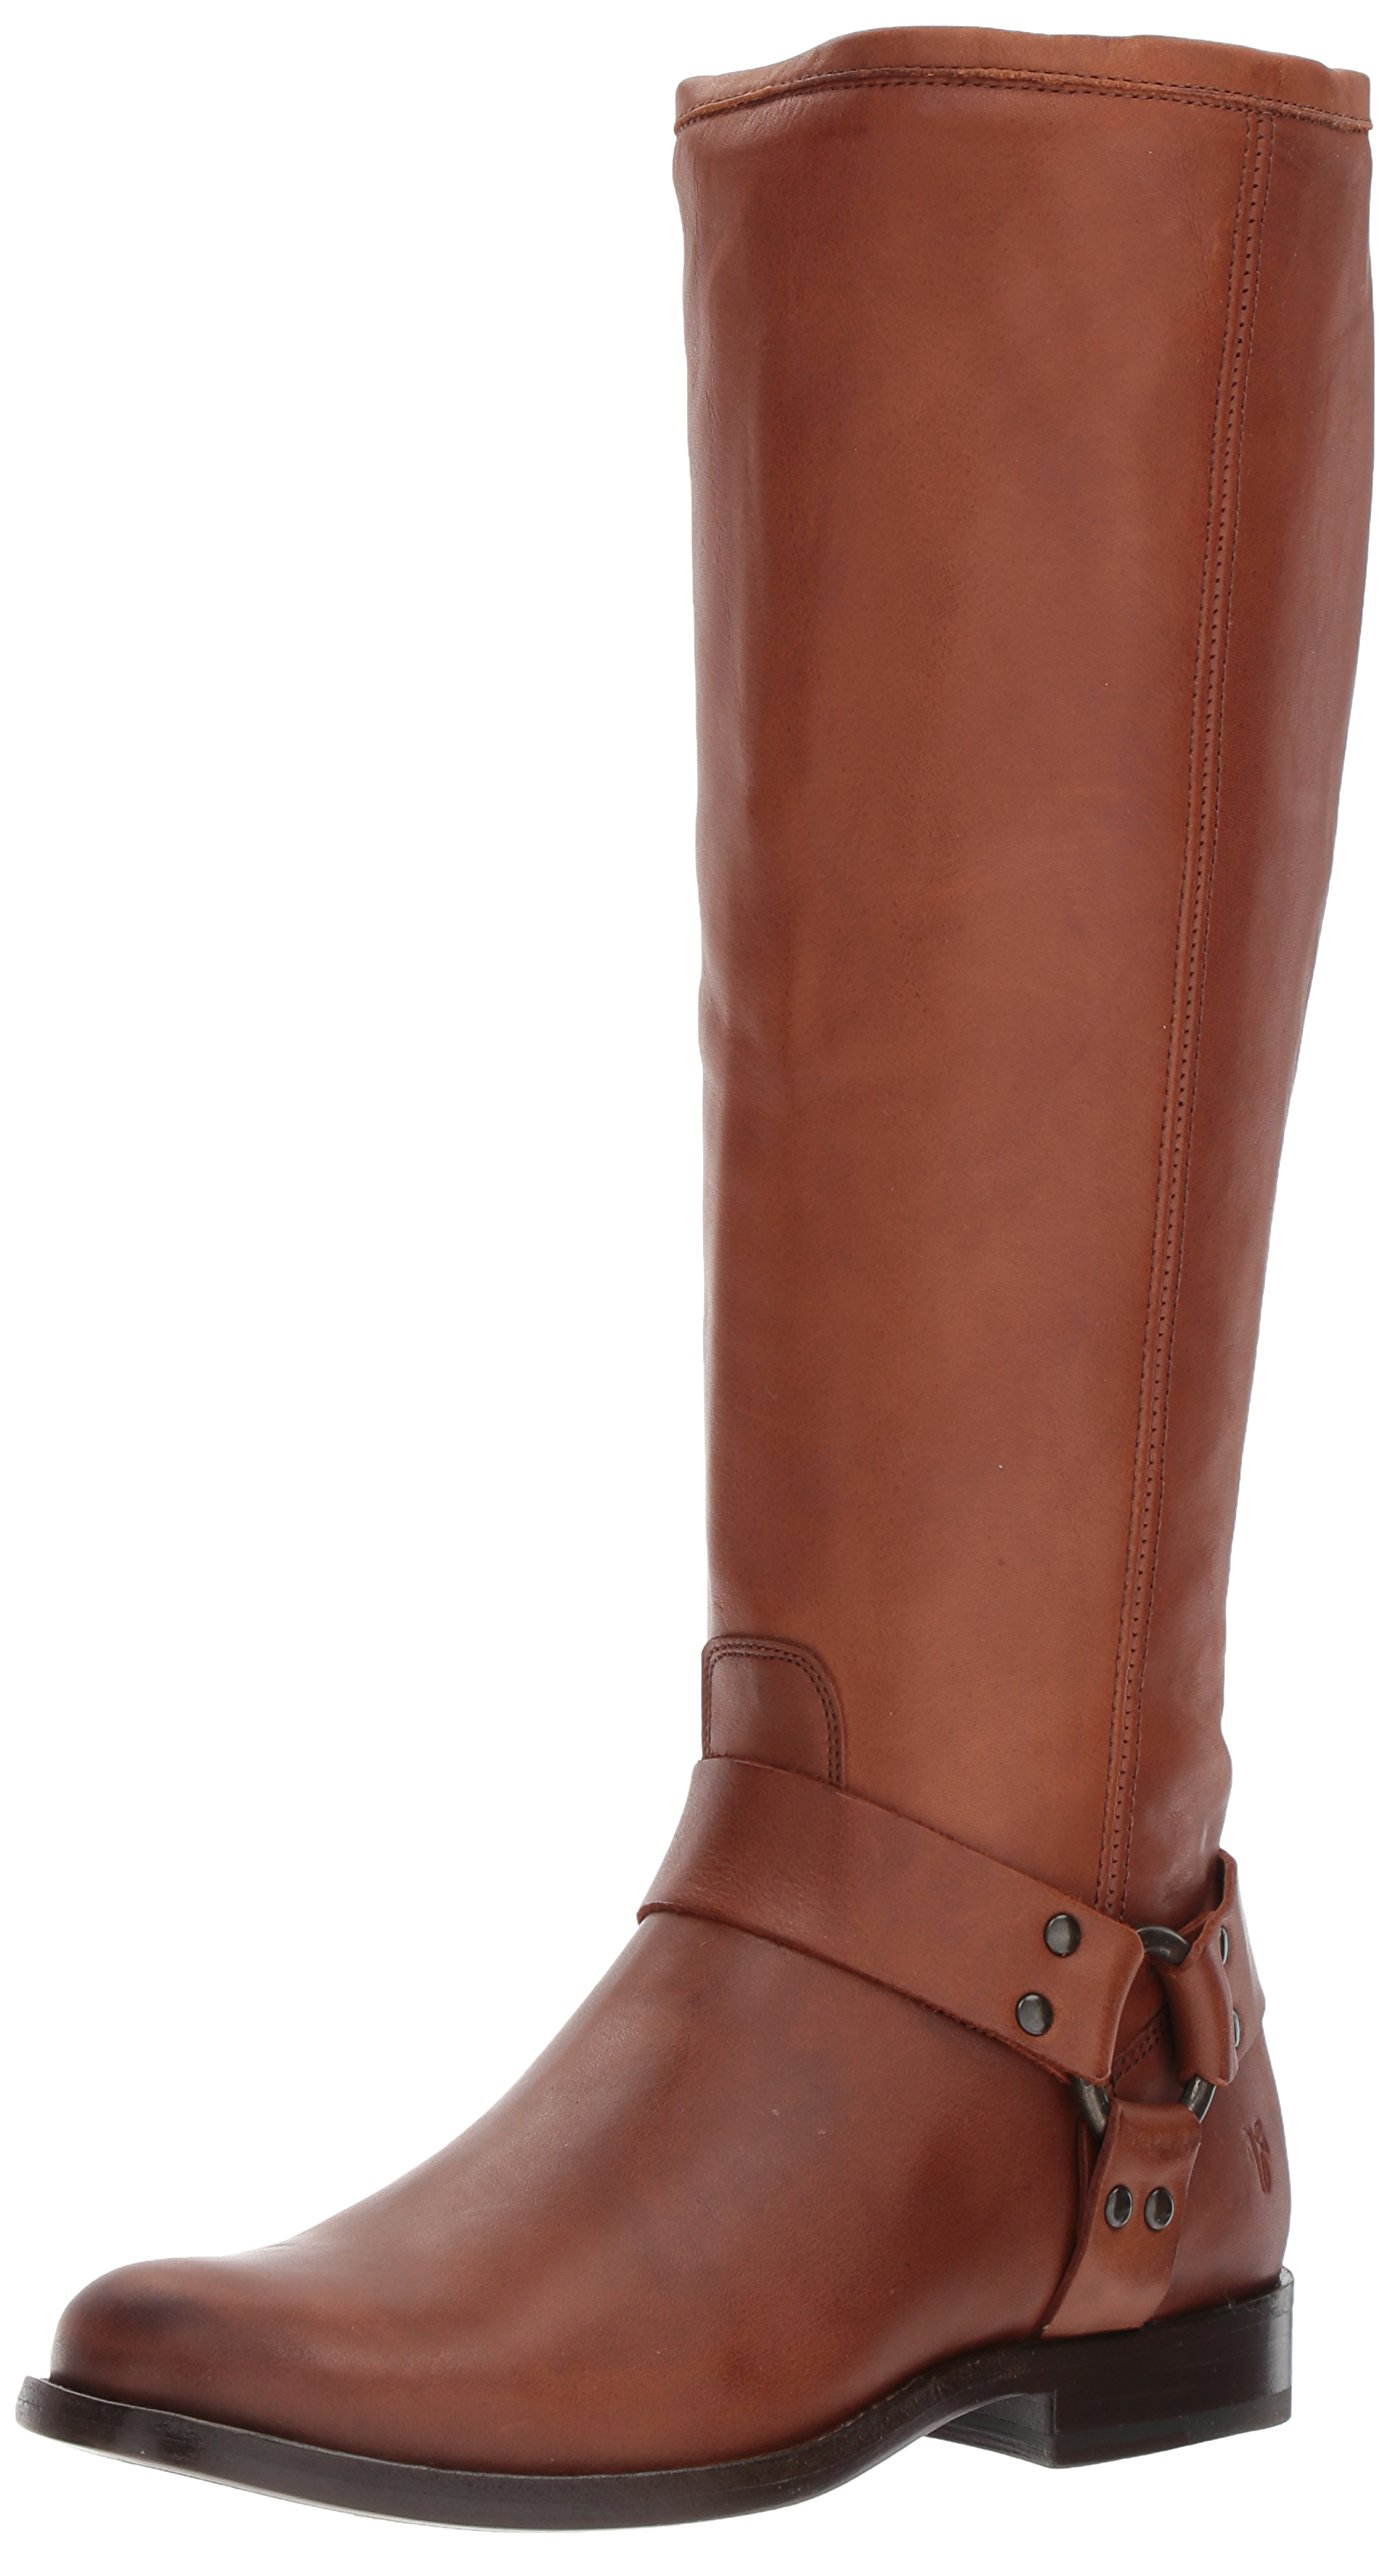 FRYE Women's Phillip Tall Harness Boot, Cognac, 9.5 M US